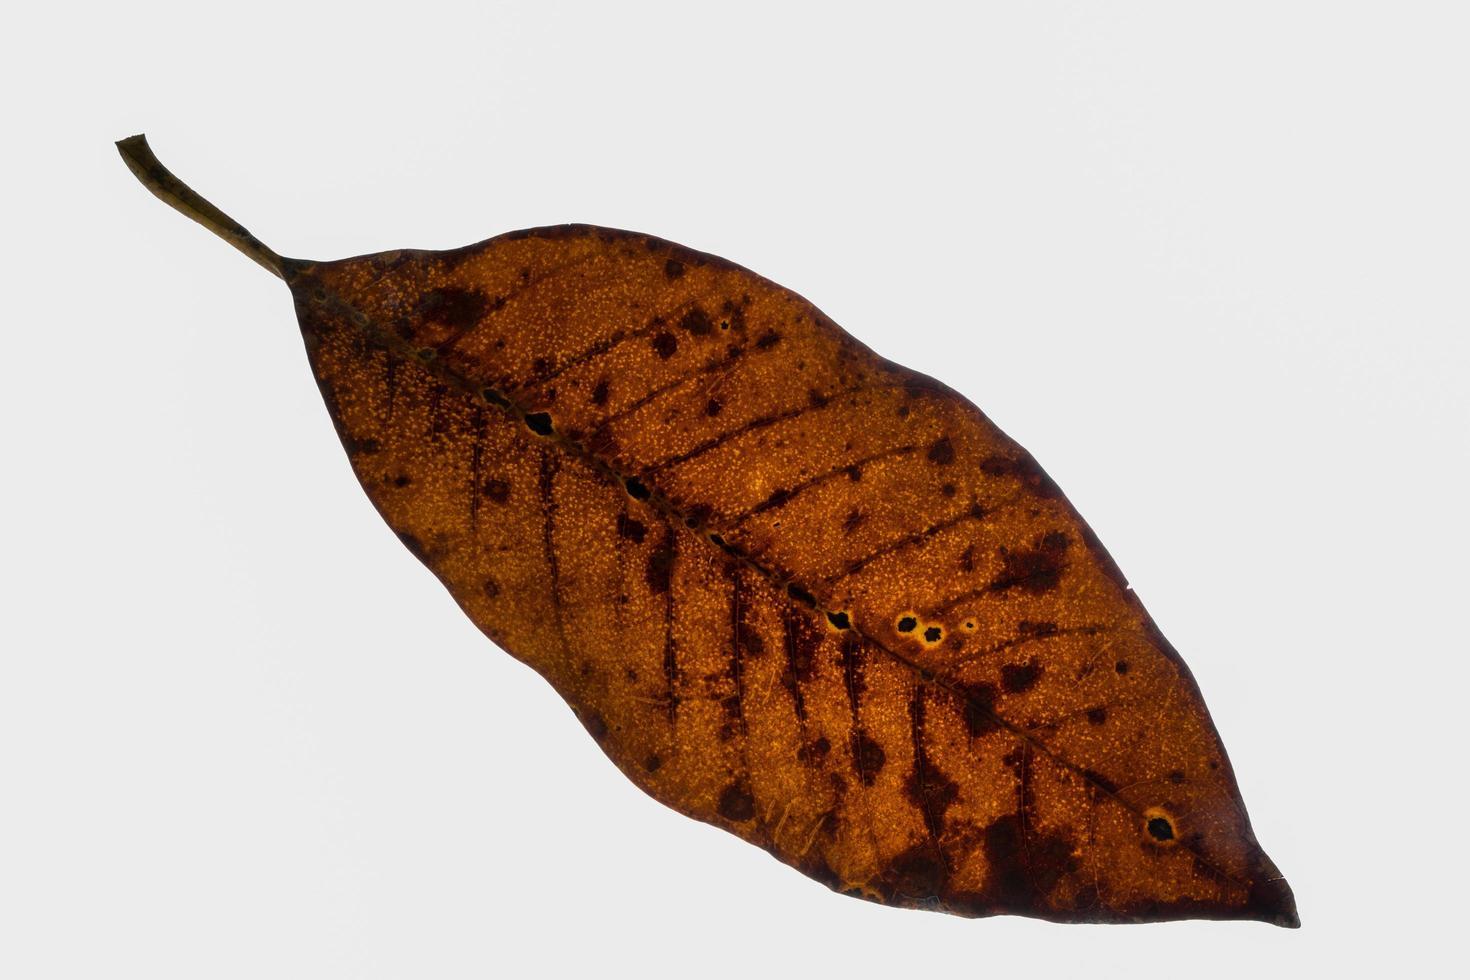 torrt blad på vit bakgrund foto